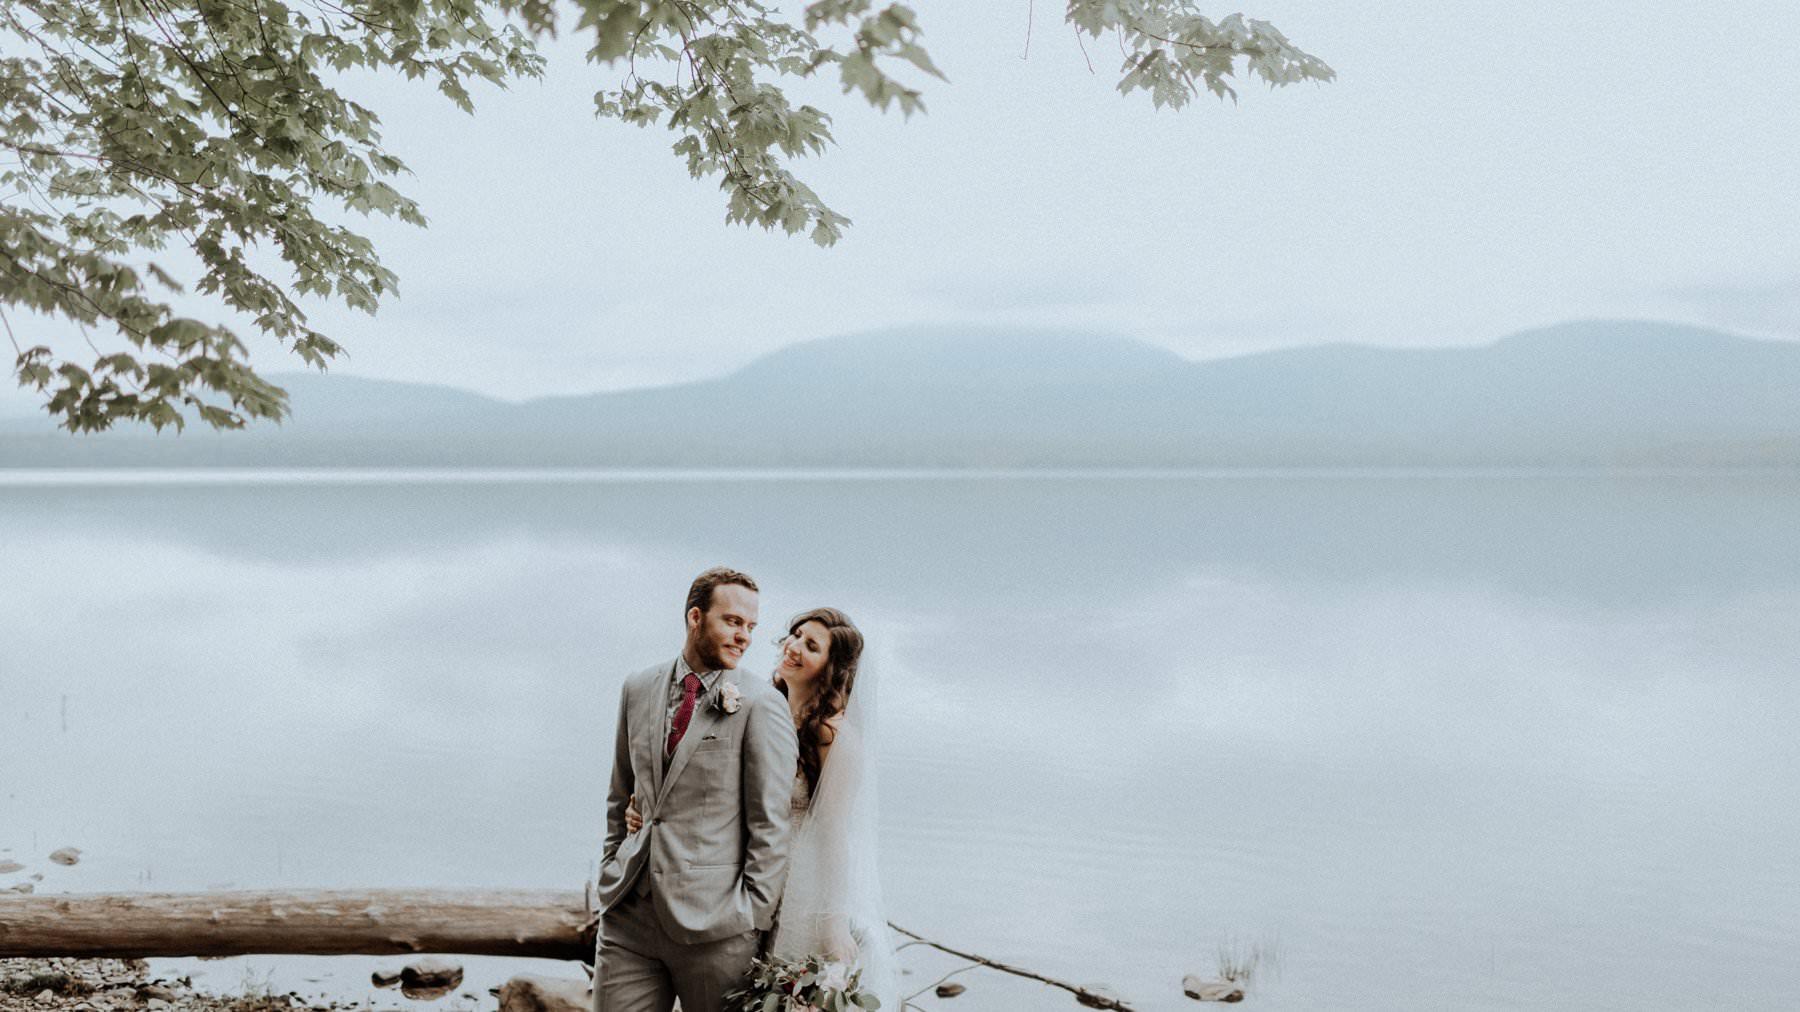 Onteora-Mountain-House-wedding-photographer-52.jpg